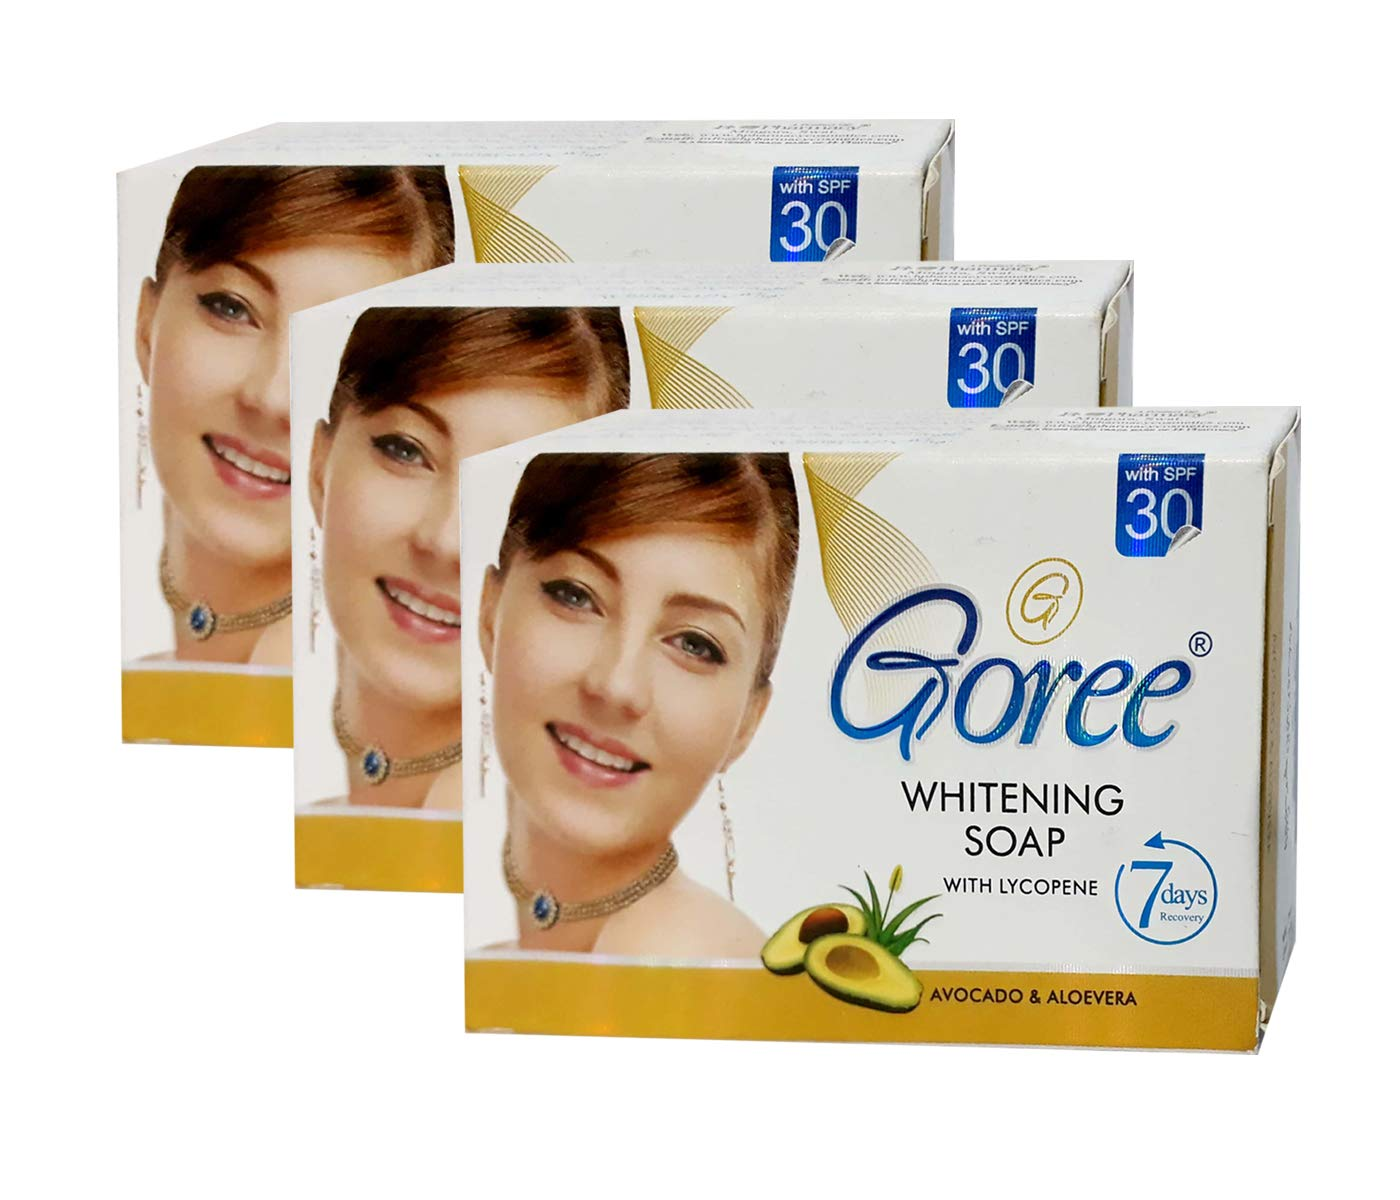 Goree Whitening Beauty Soap PACk Of 3